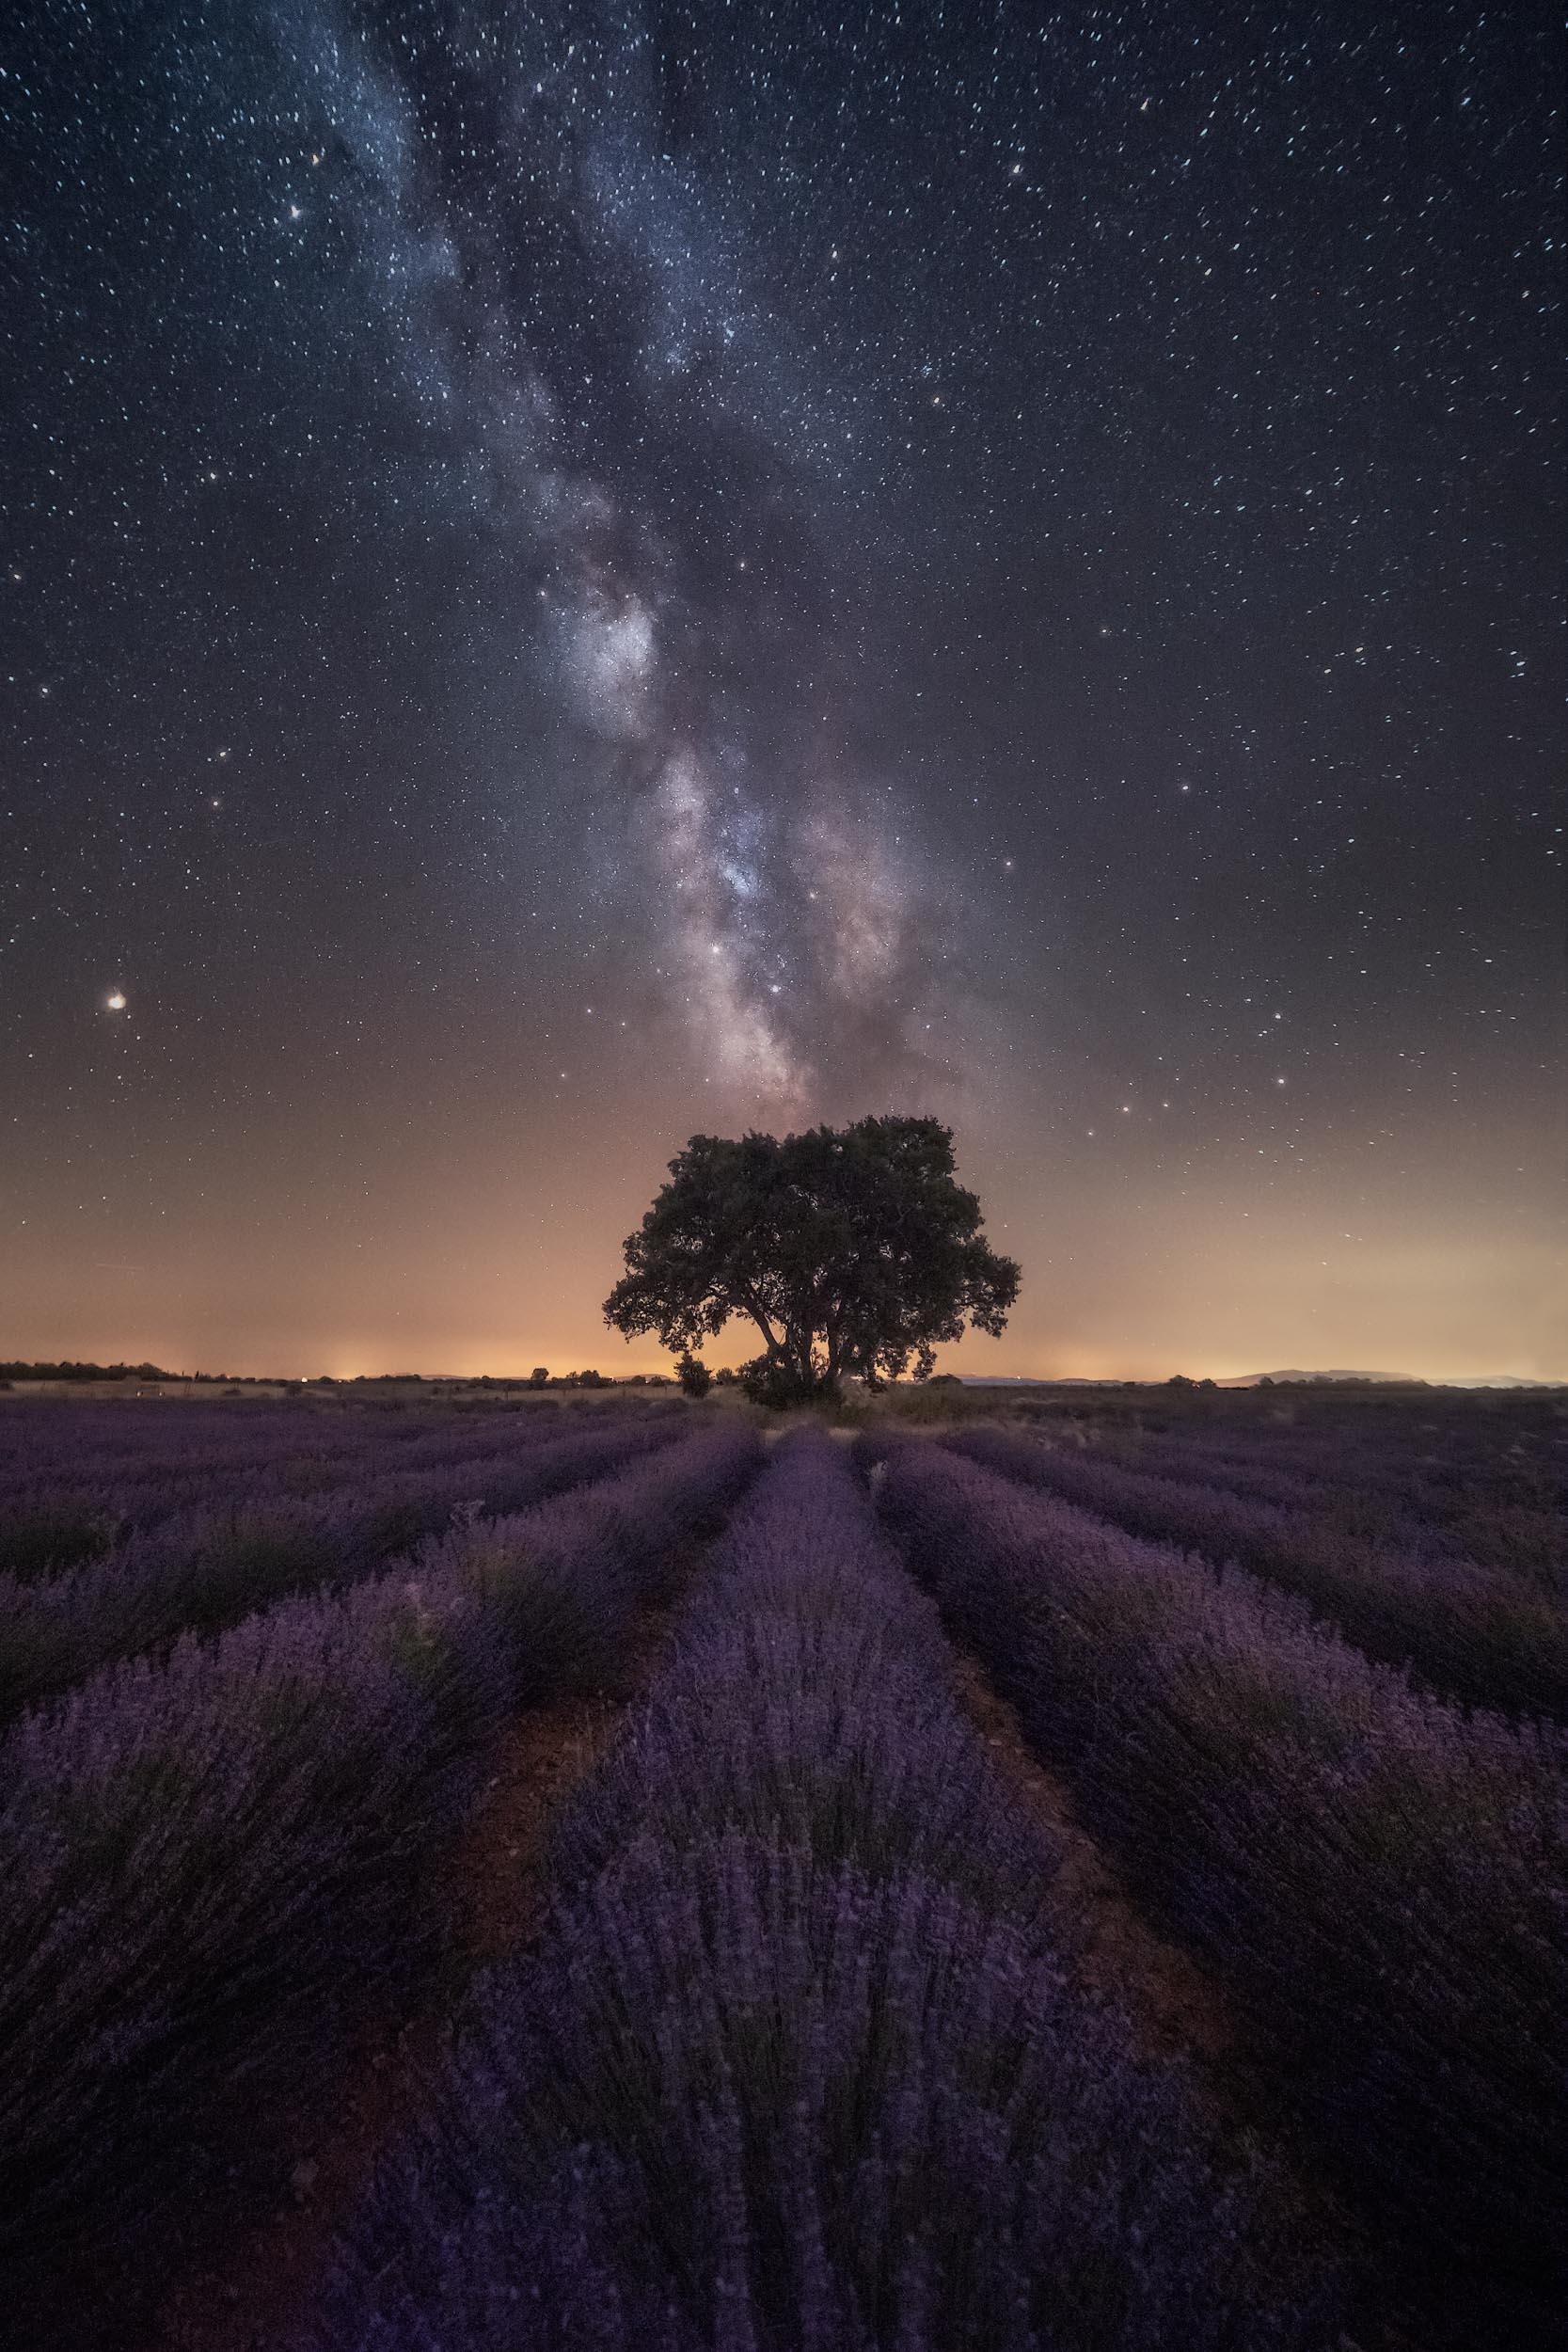 Uplifting Cosmos